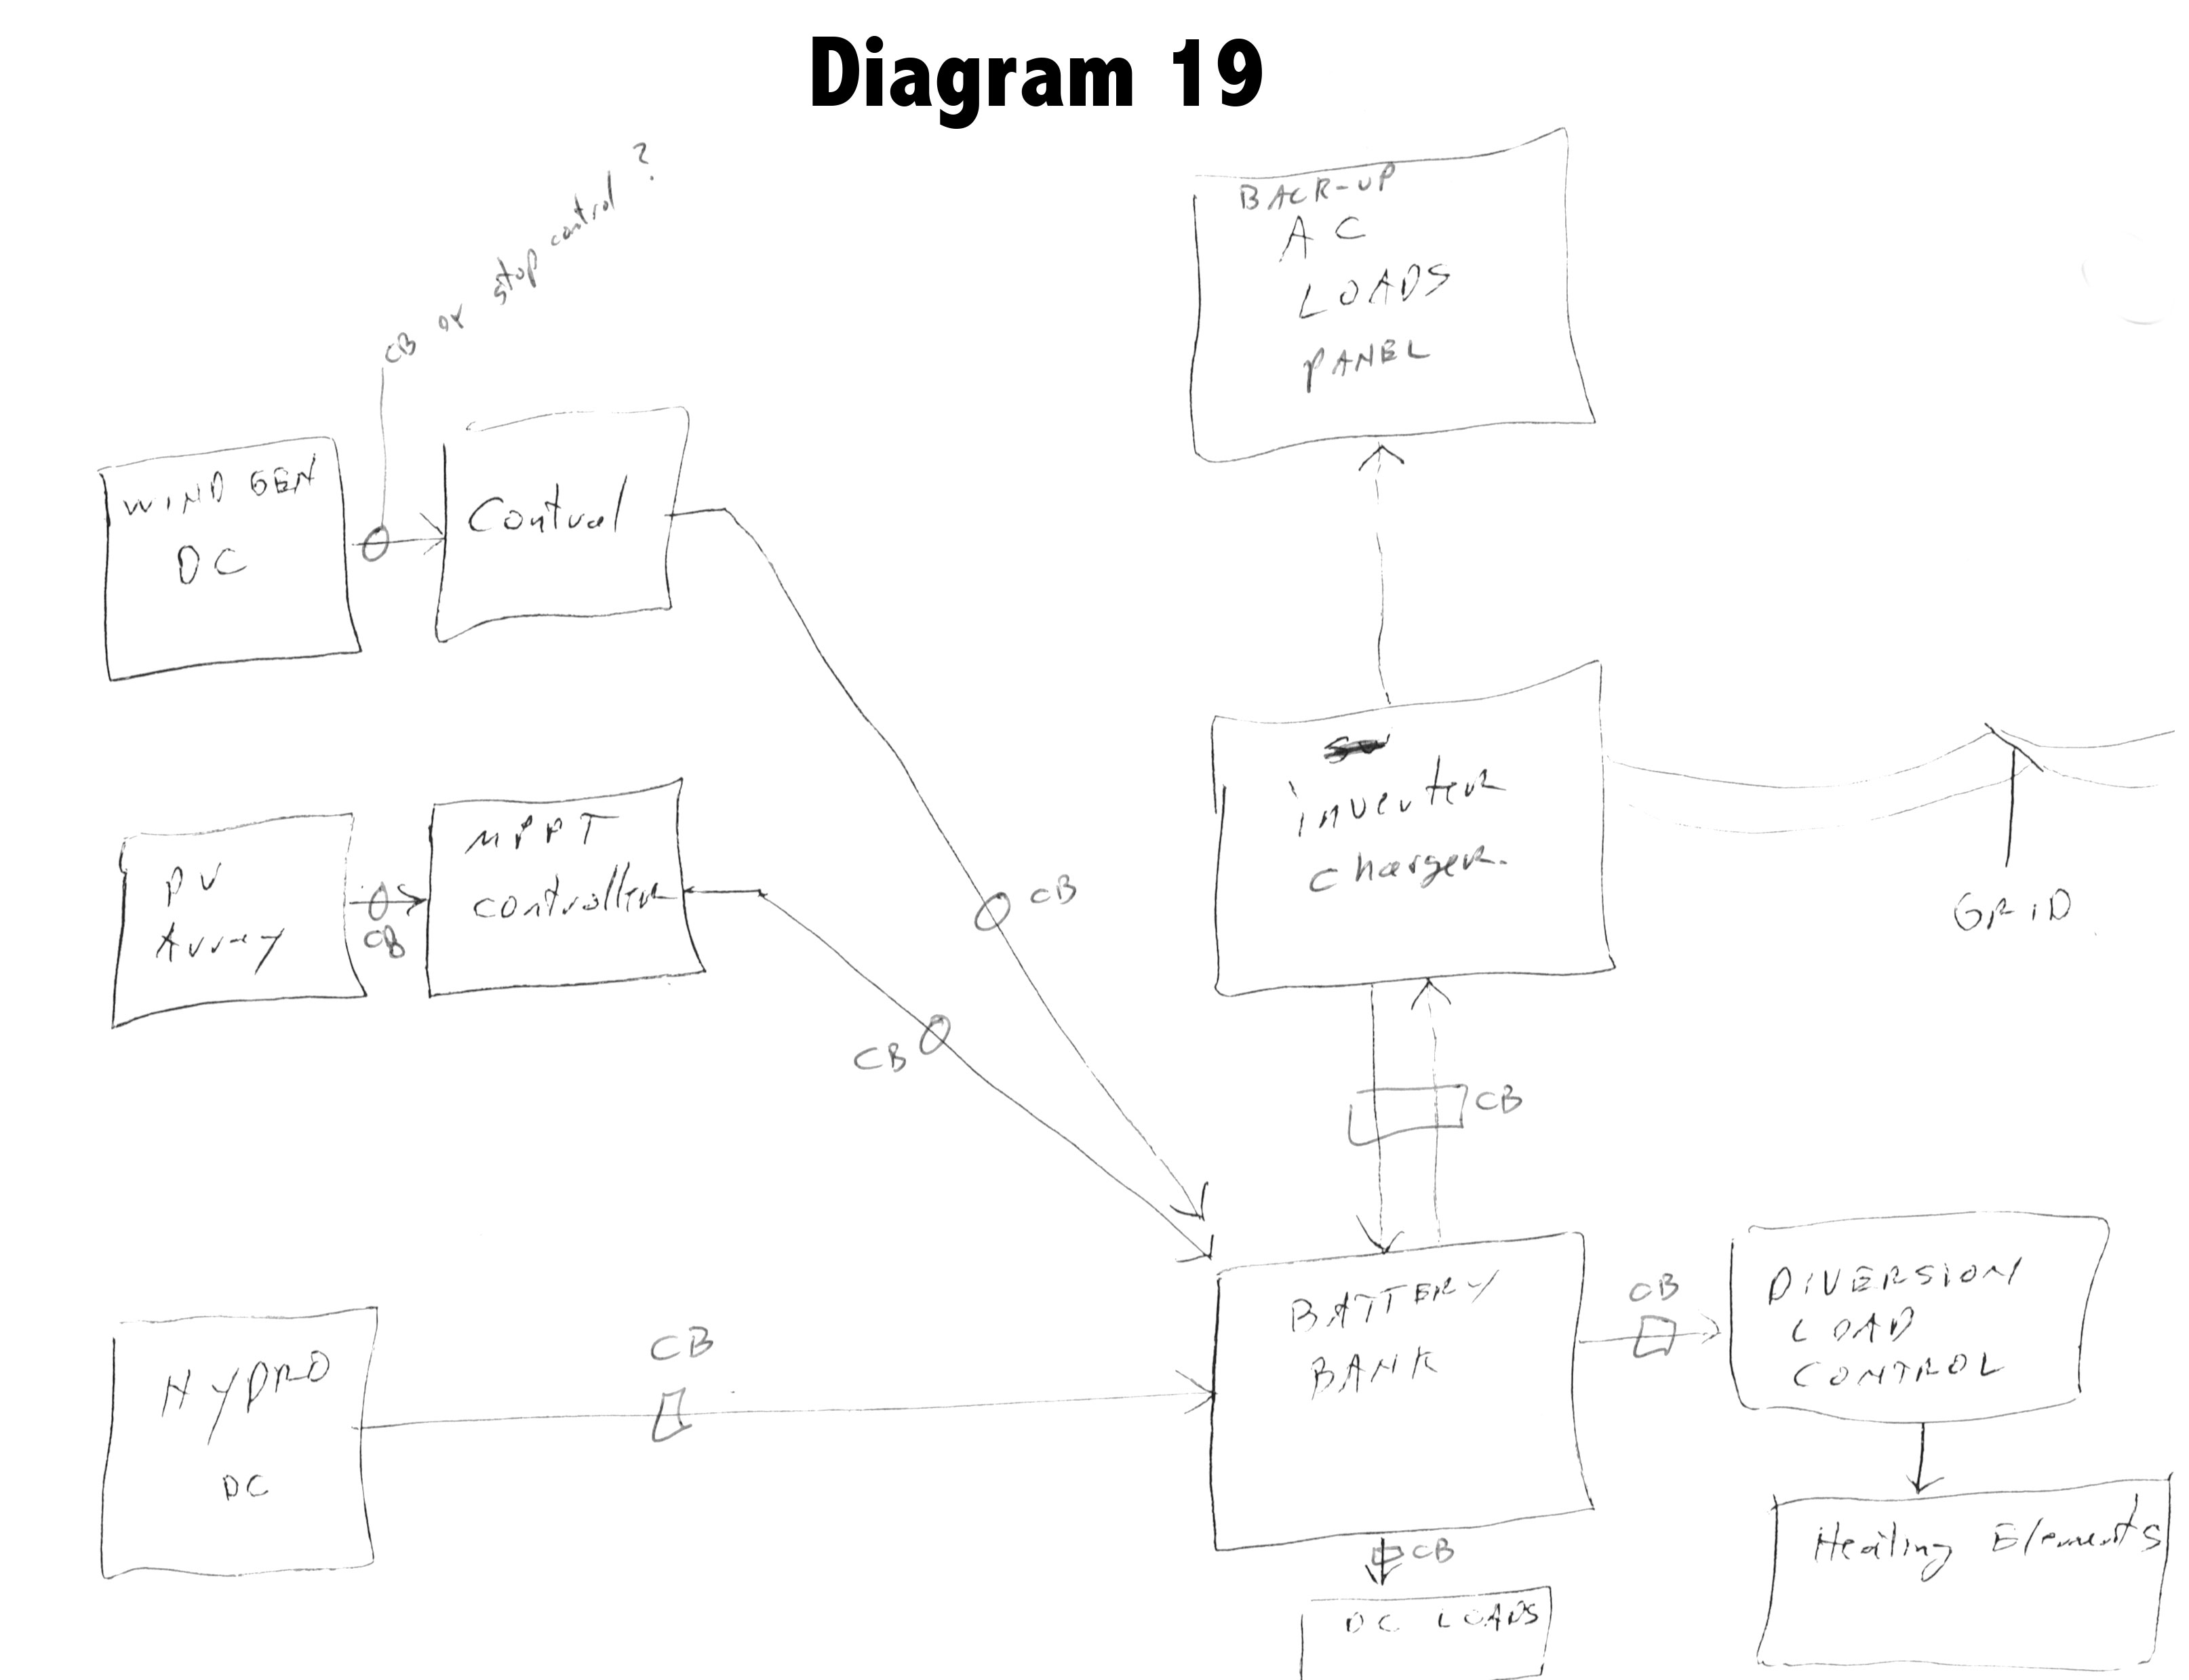 limitorque mxa 20 wiring diagram